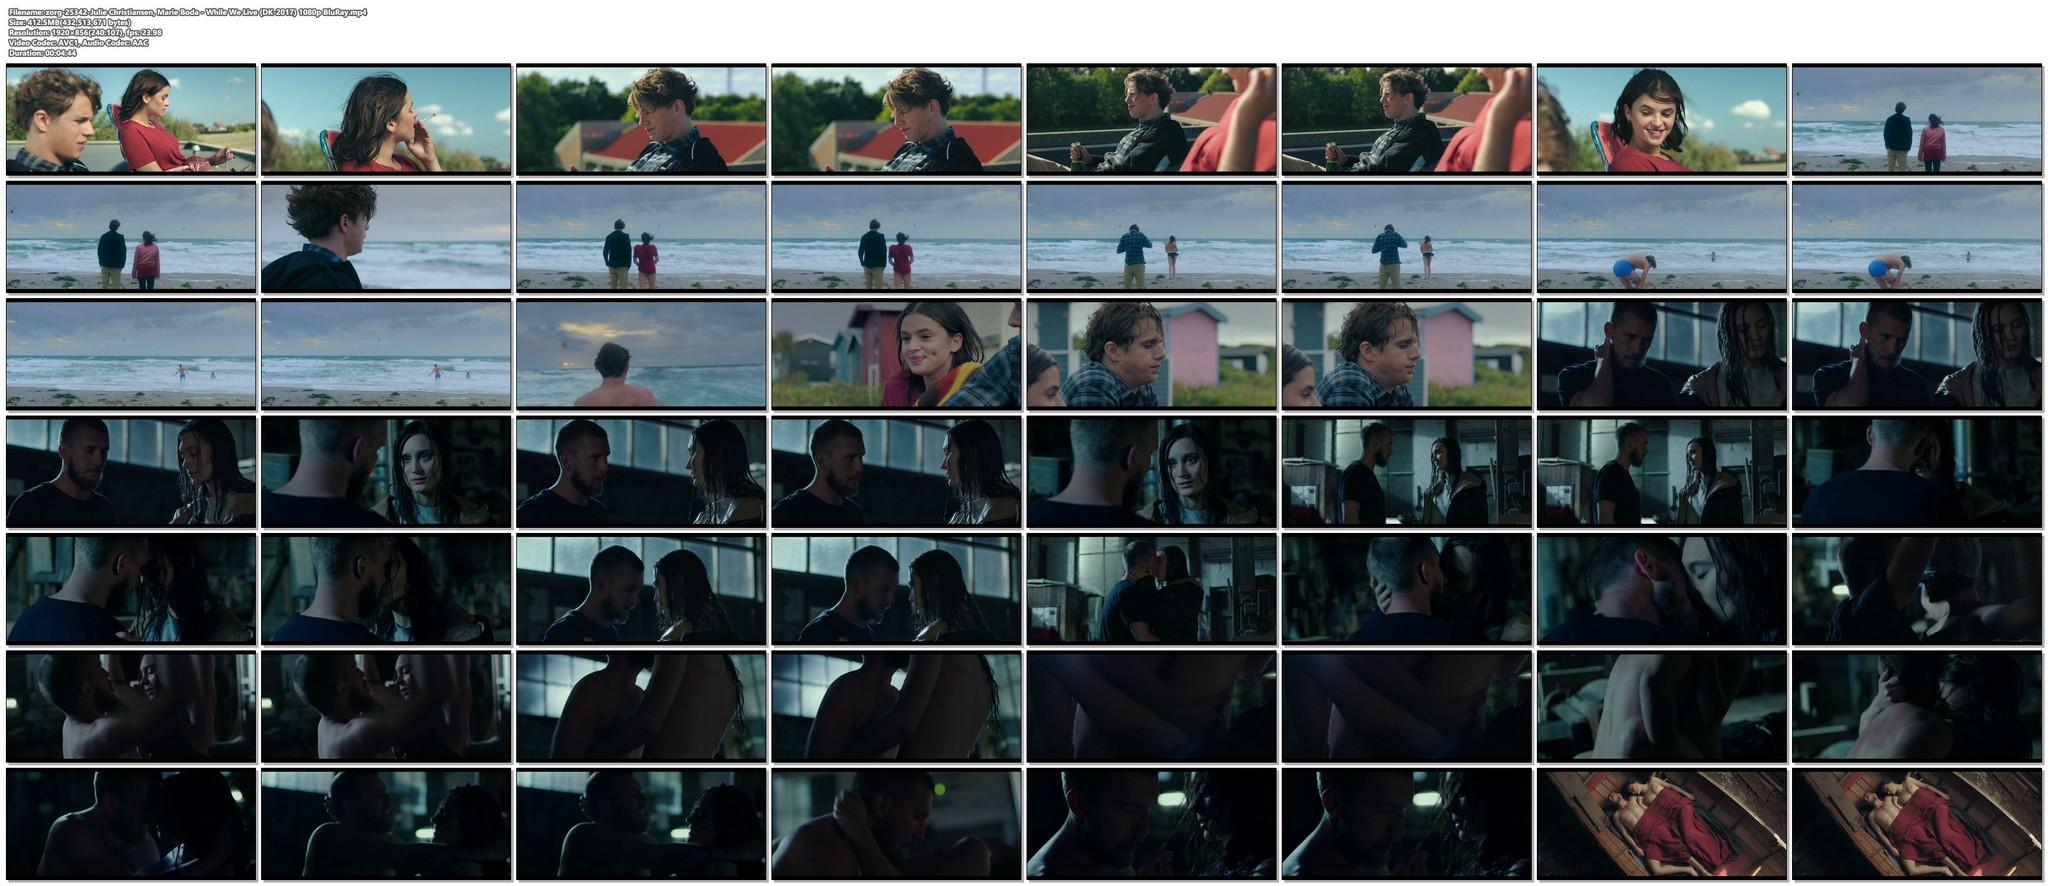 Julie Christiansen nude sex Marie Boda sexy While We Live DK 2017 1080p BluRay 15